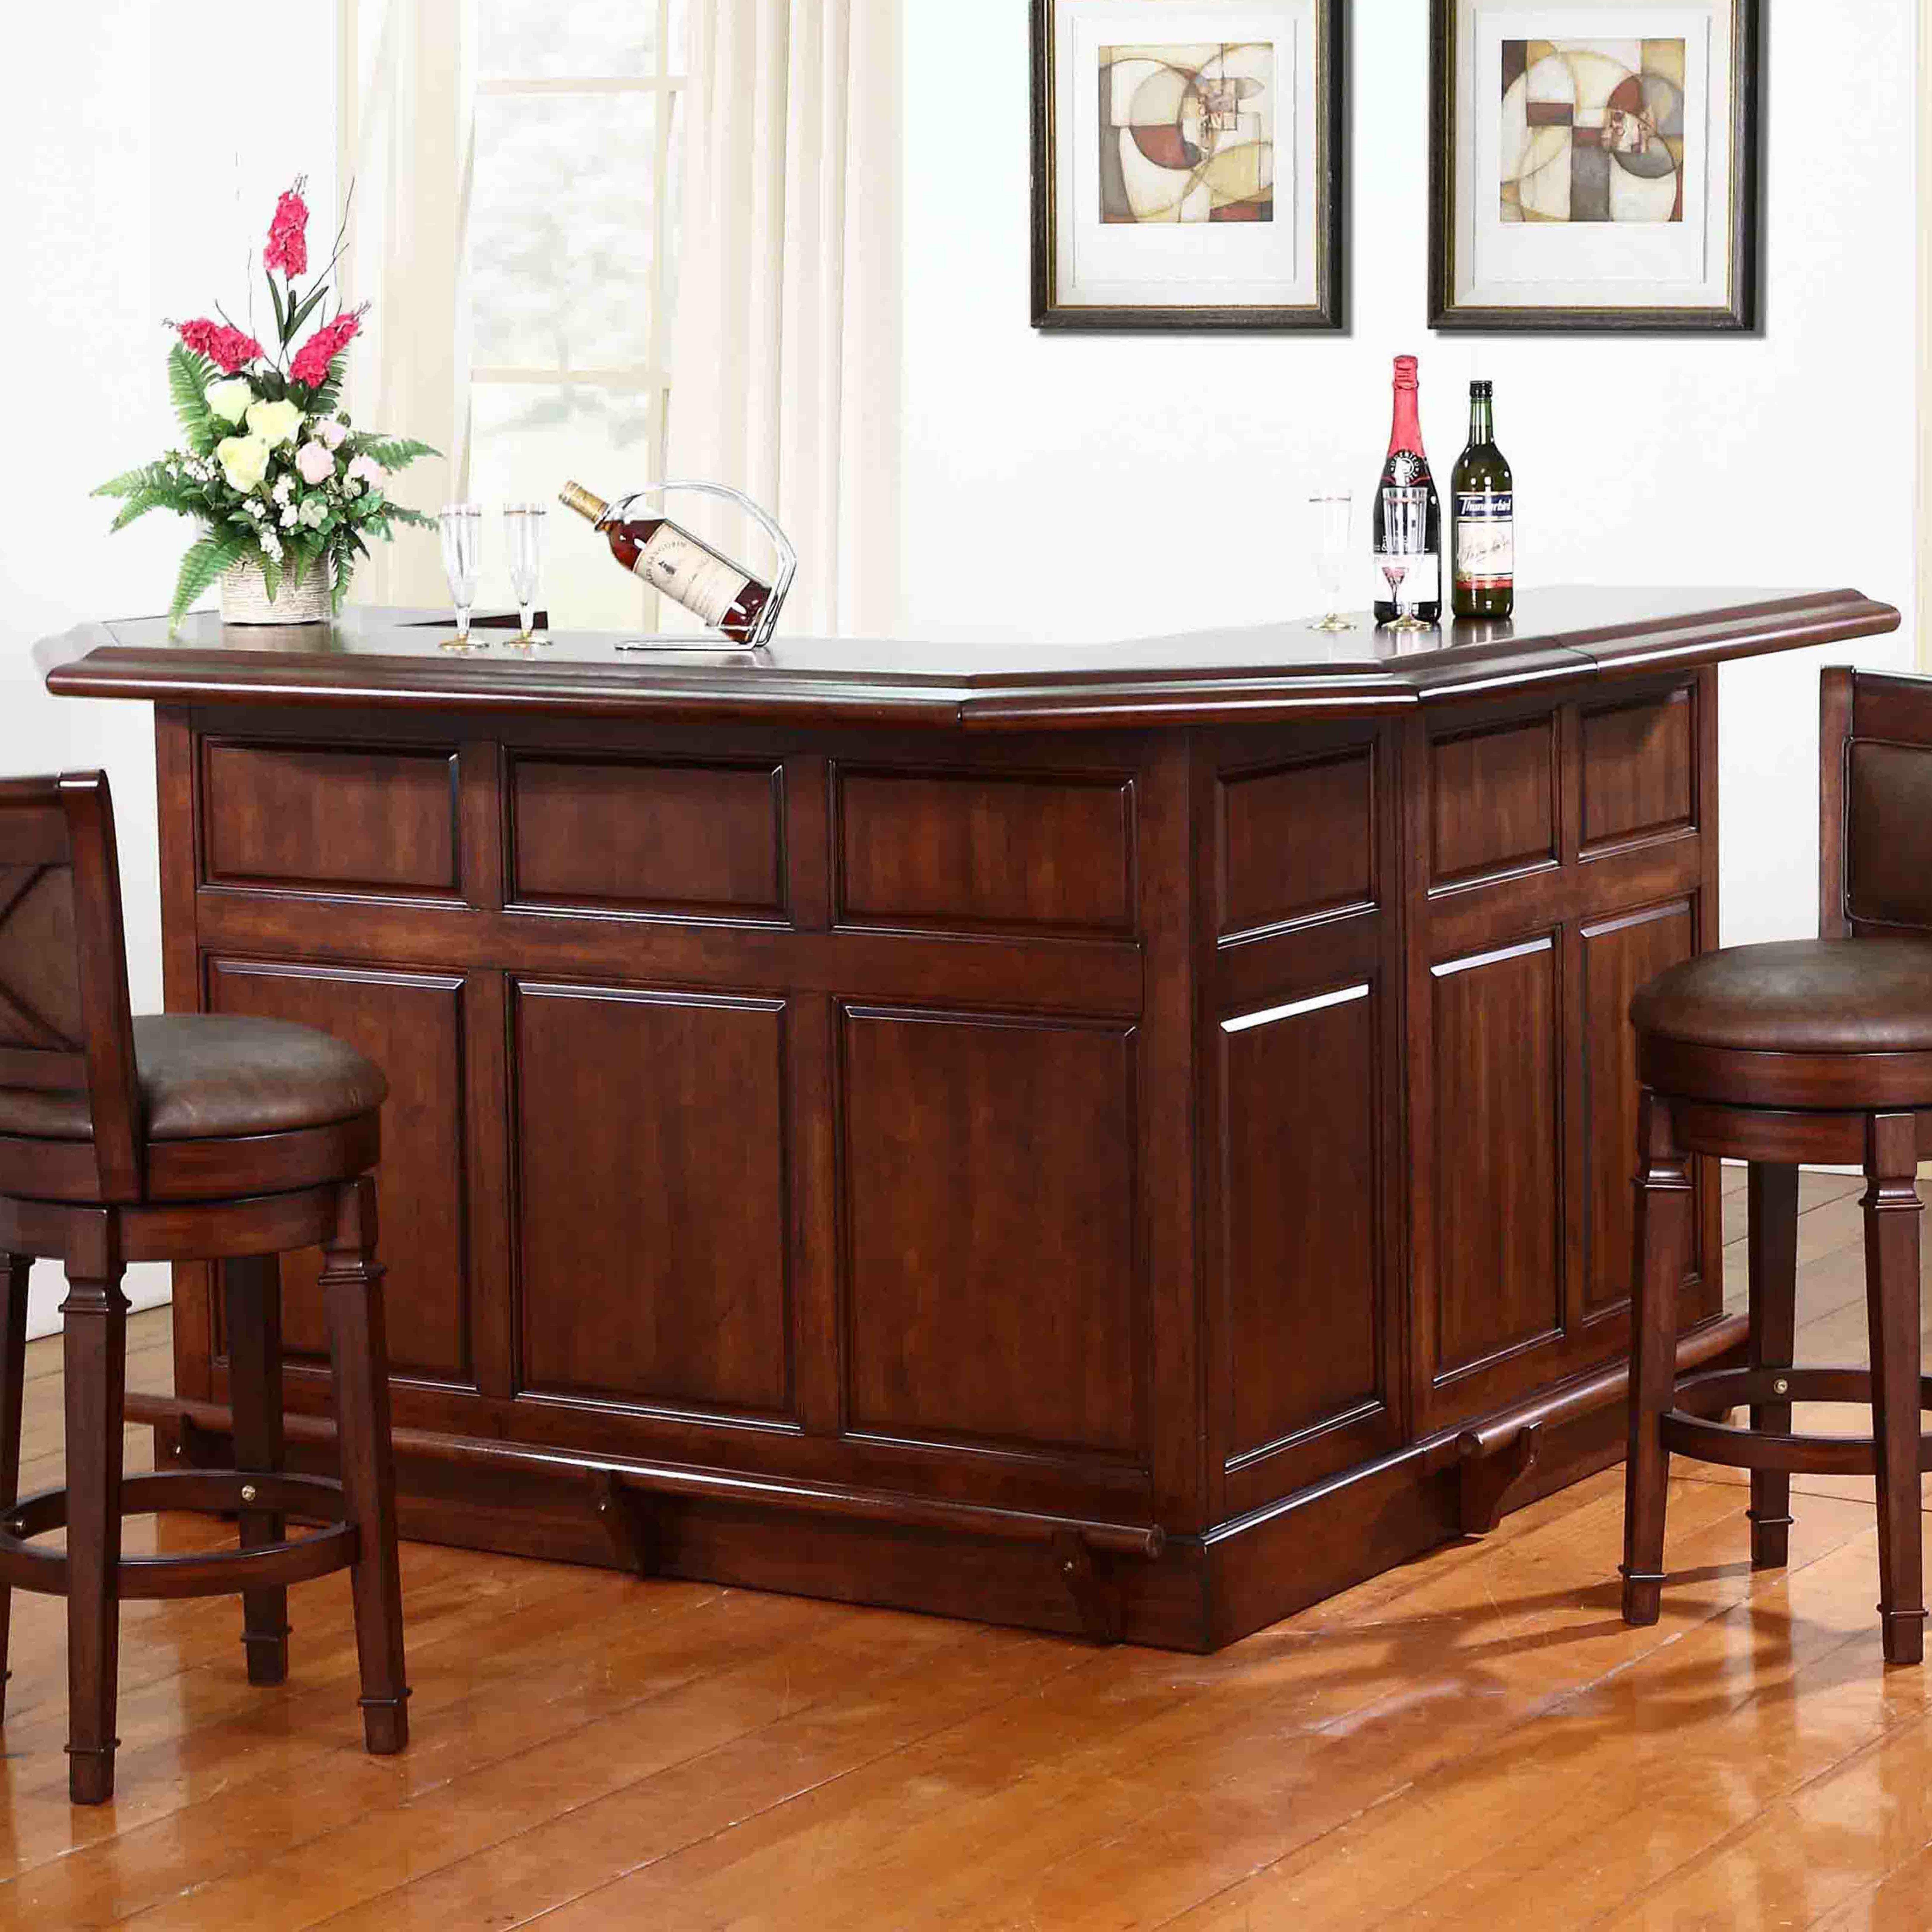 ECI Furniture Belvedere Home Bar & Reviews